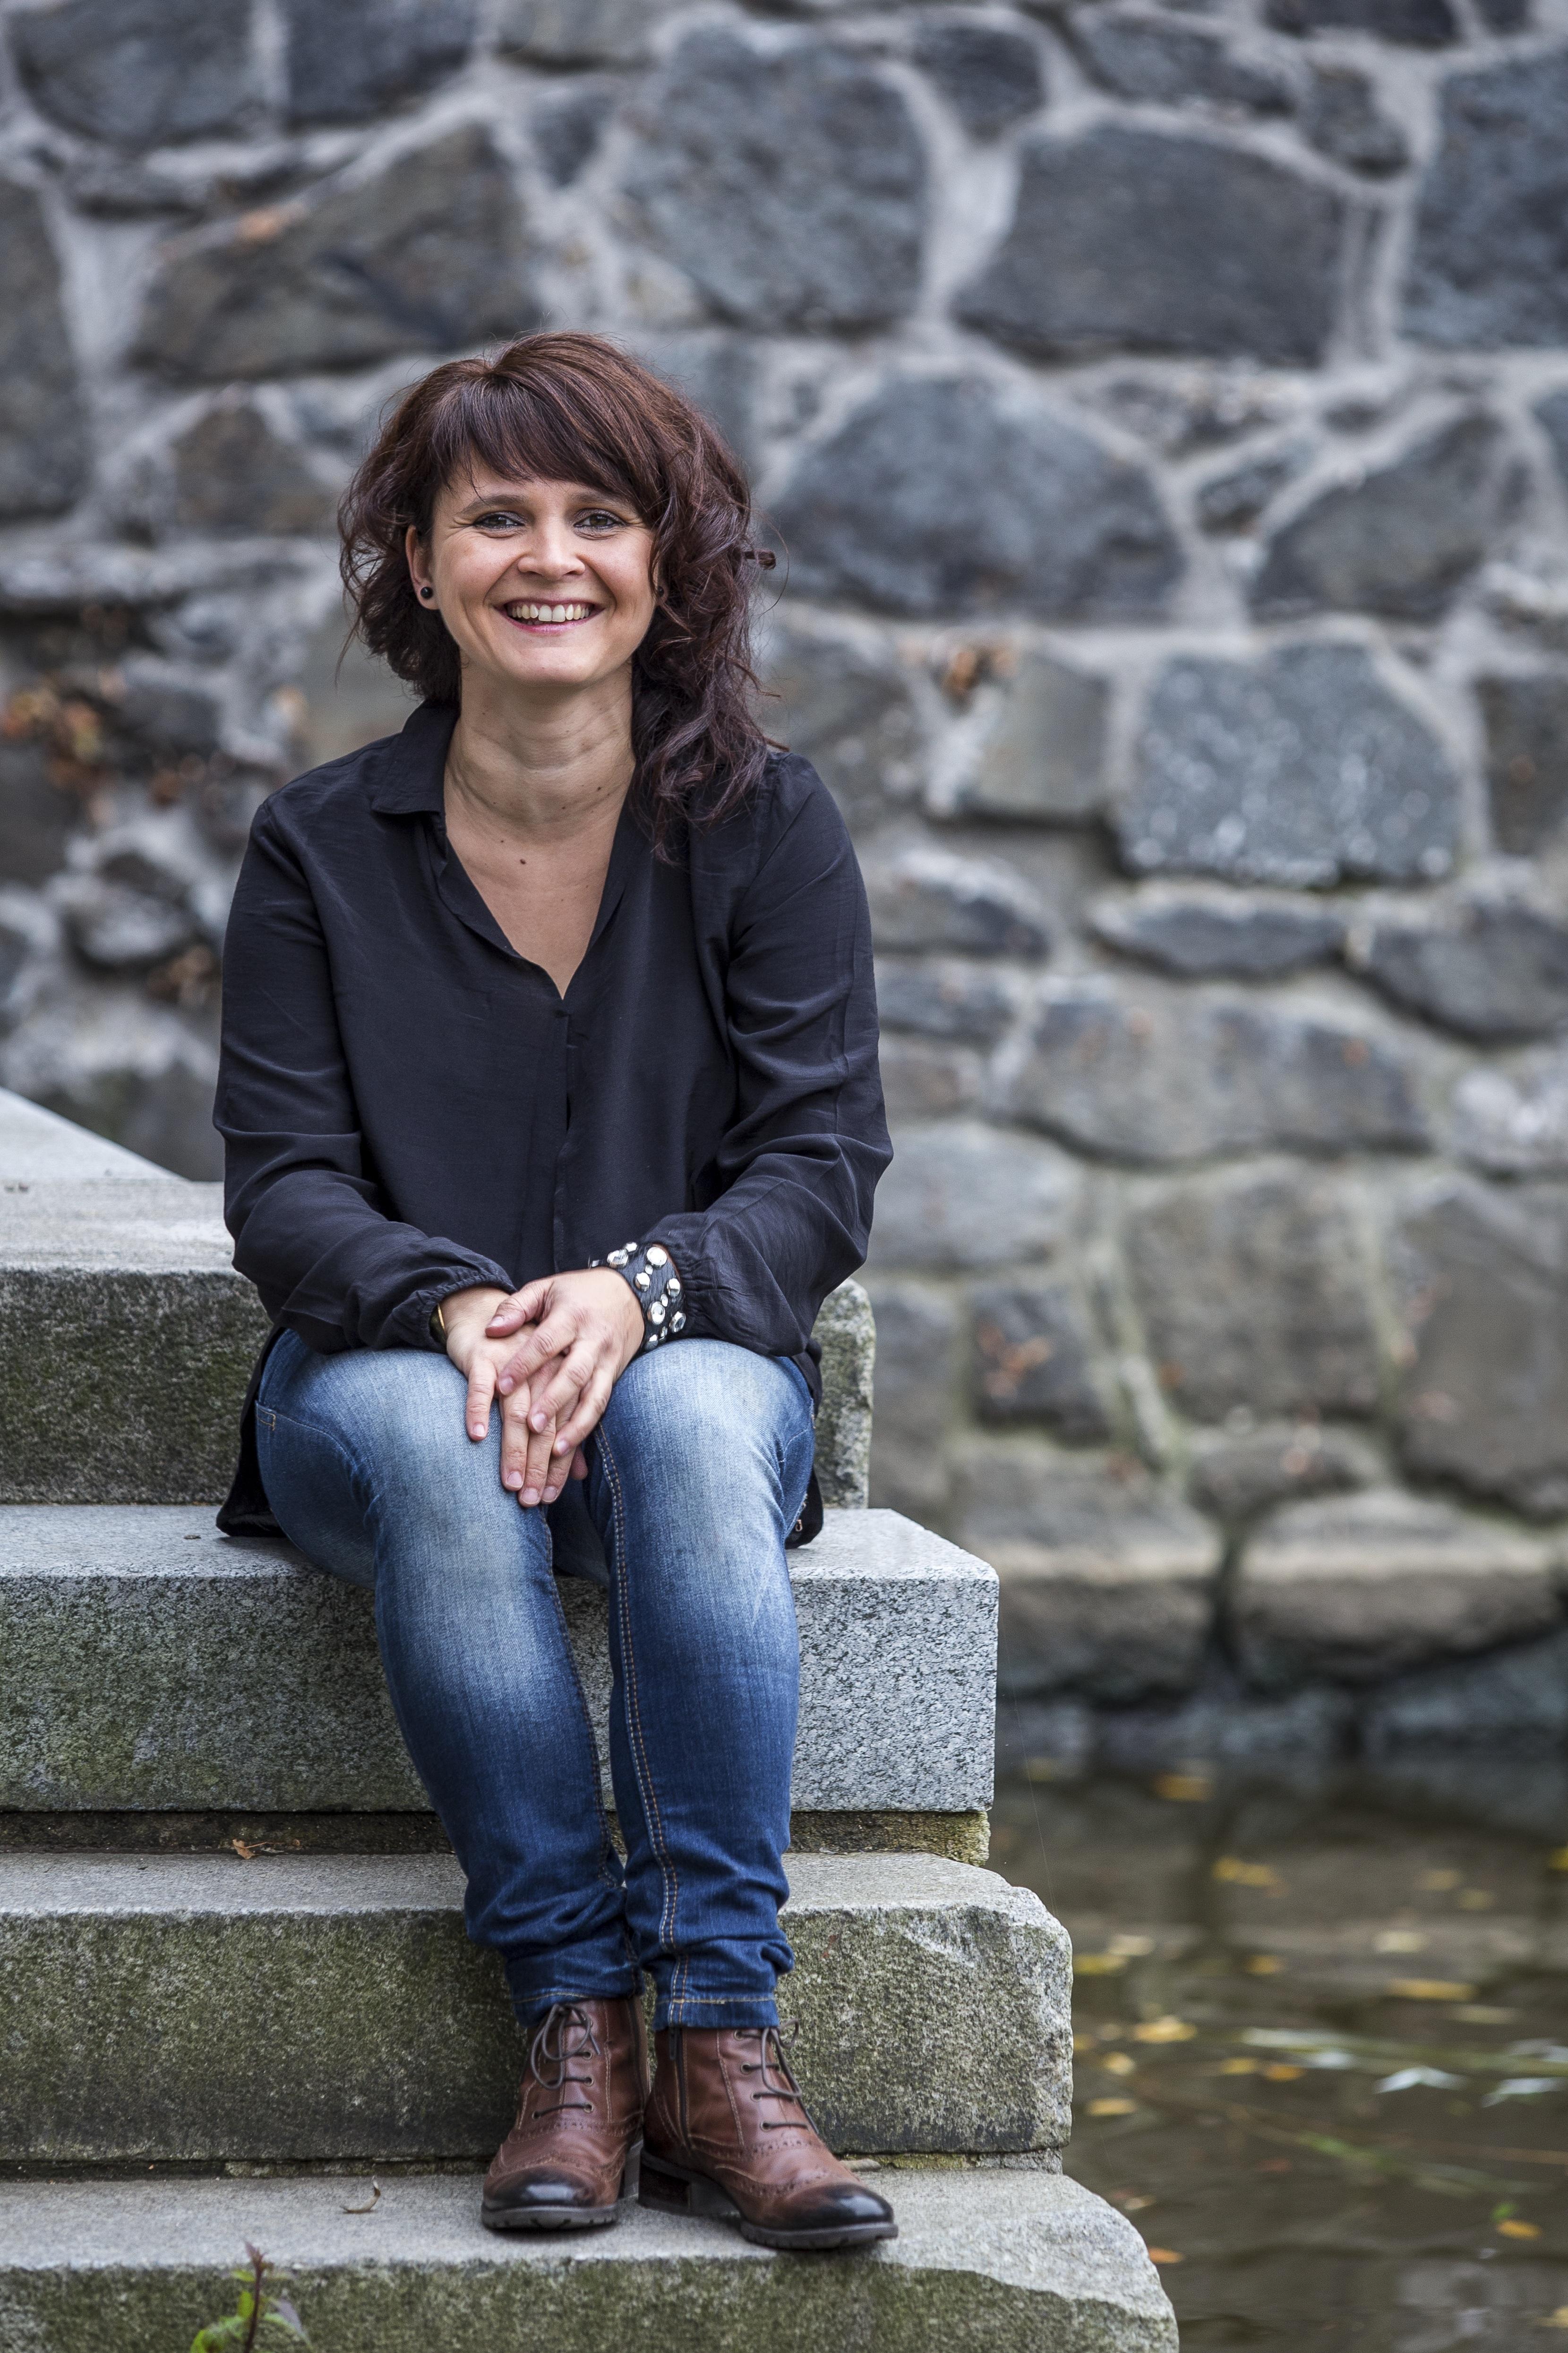 Beata Hlavenková reveals time – review – Milan Bátor for Ostravan.cz